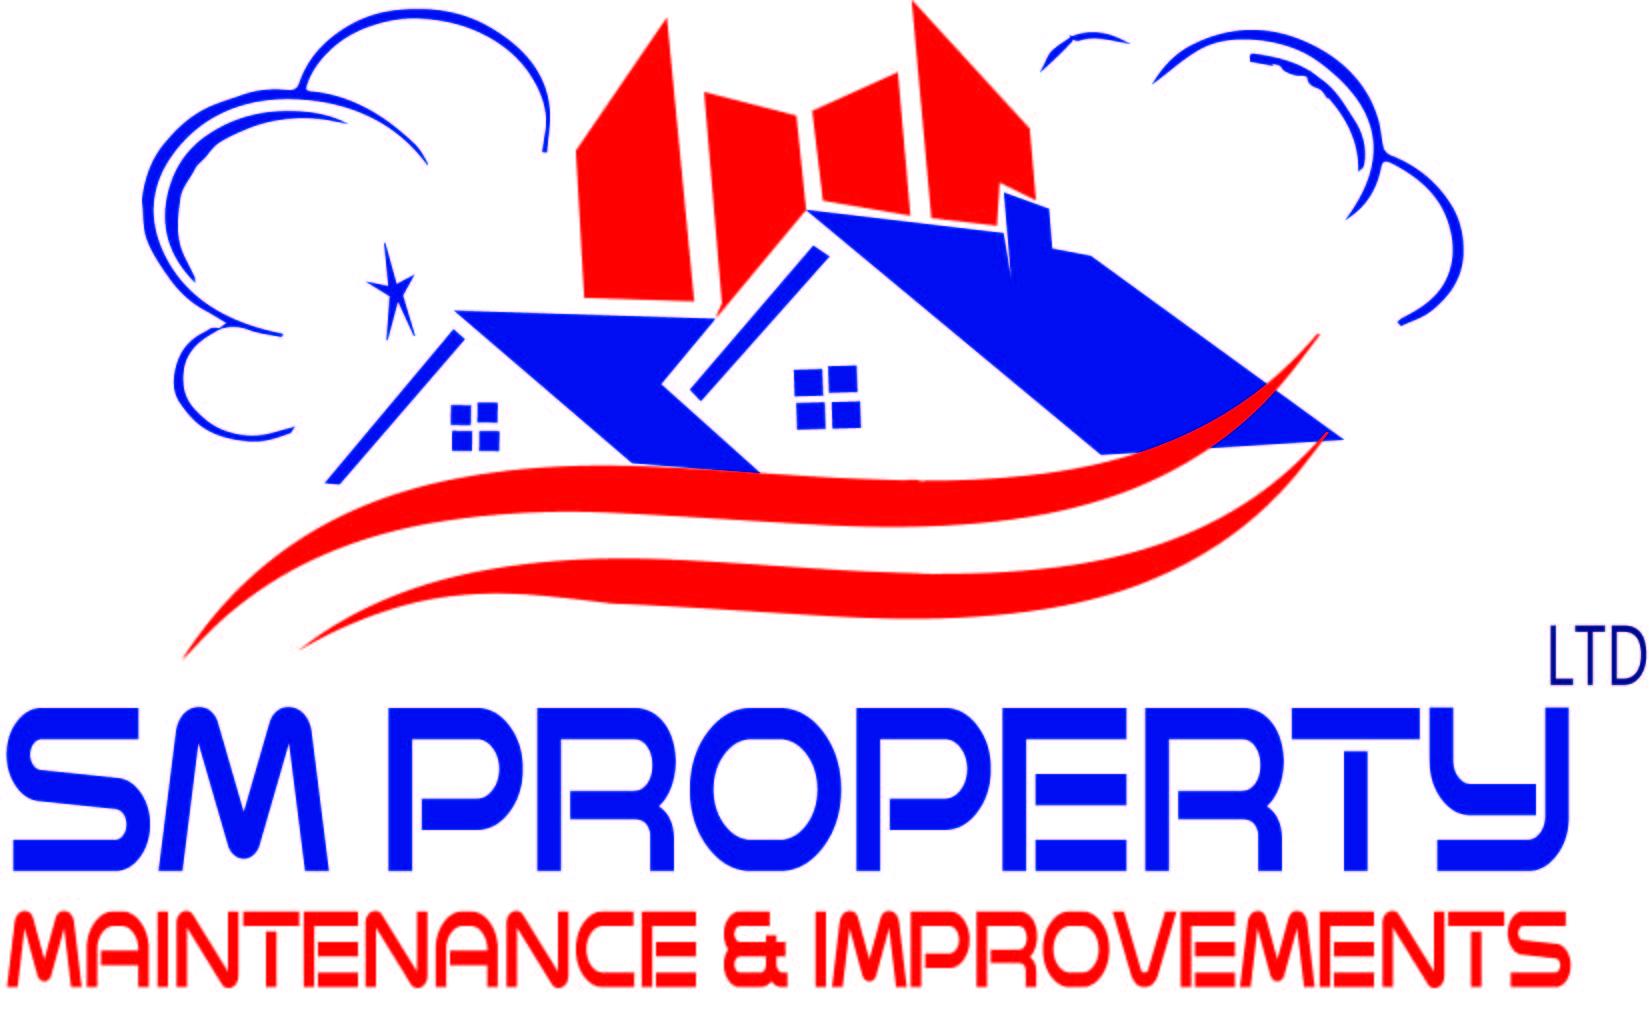 SM Property Maintenance